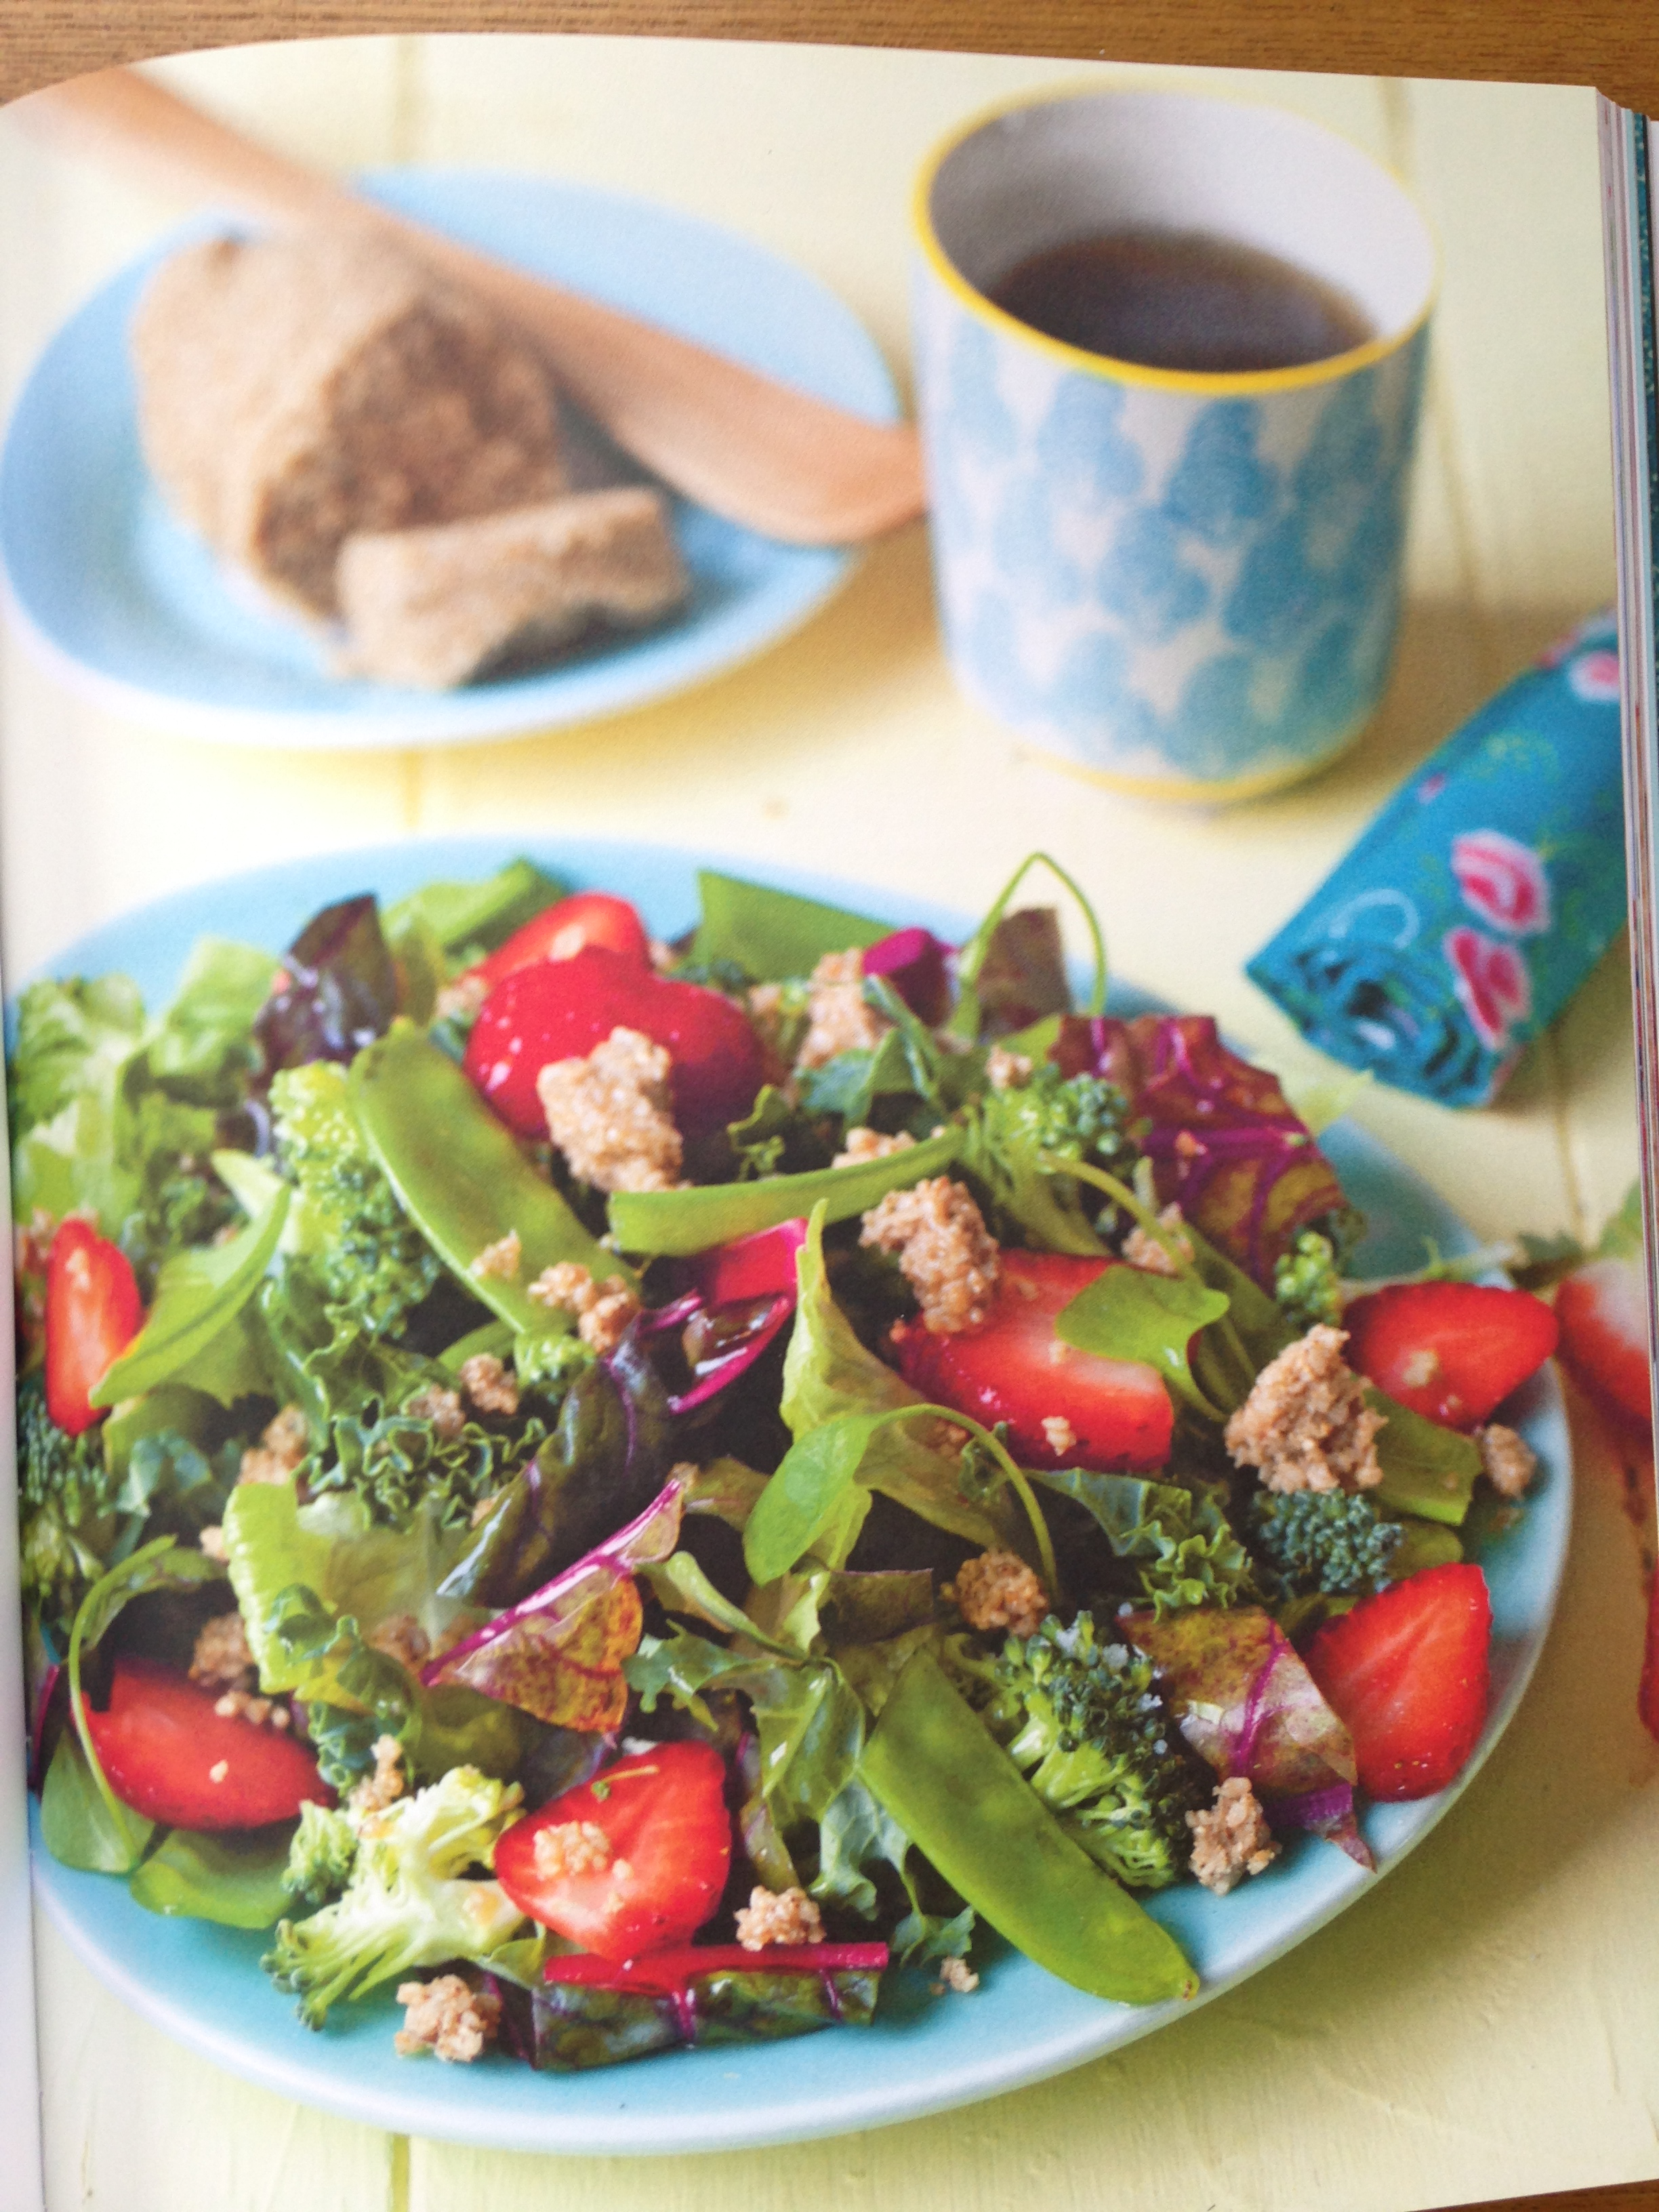 le placard-green-glam-gourmande-rebecca-Leffler-salade-d-été